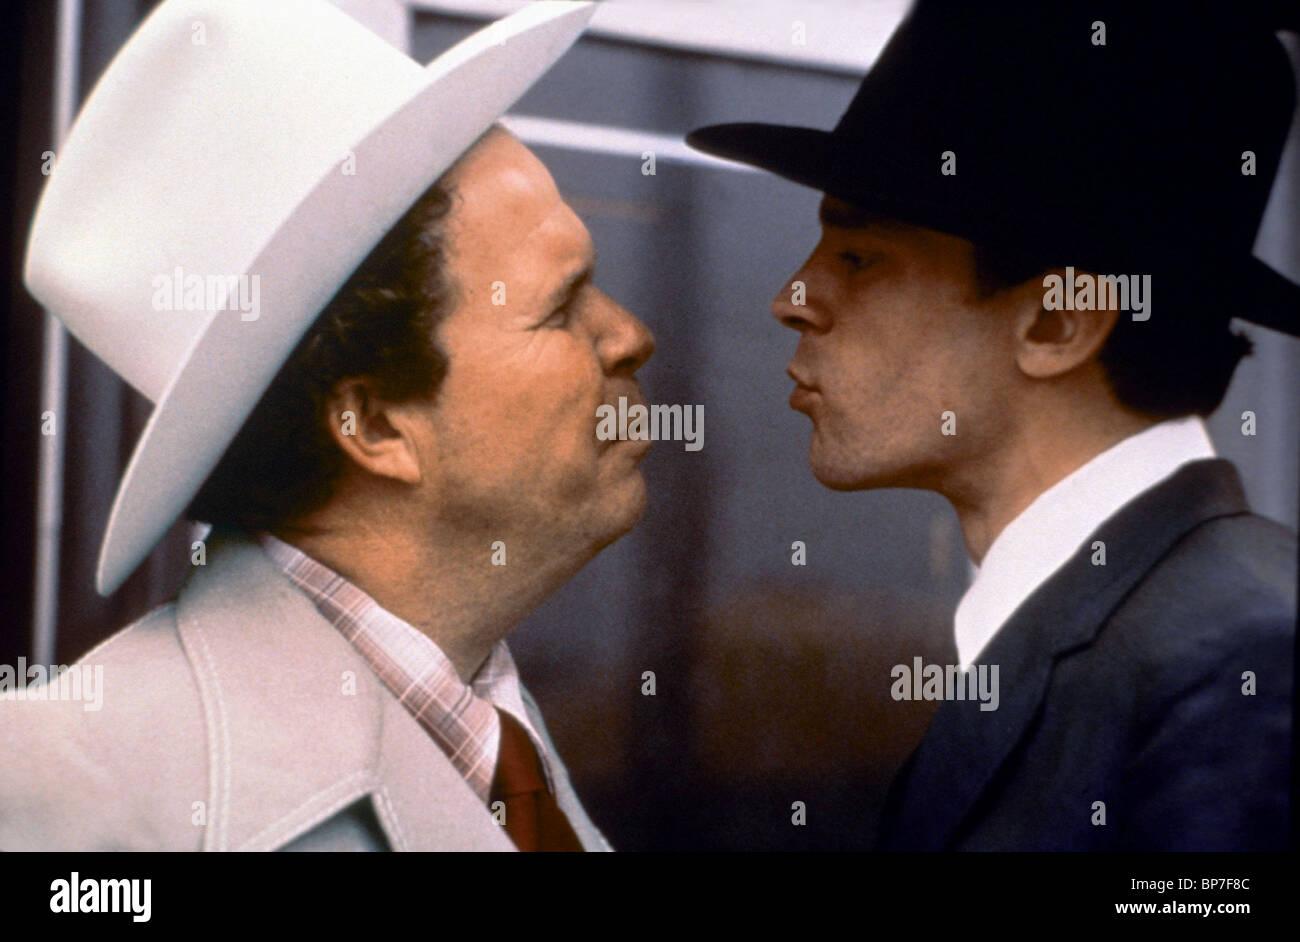 NED BEATTY & BRAD DOURIF WISE BLOOD (1979) - Stock Image